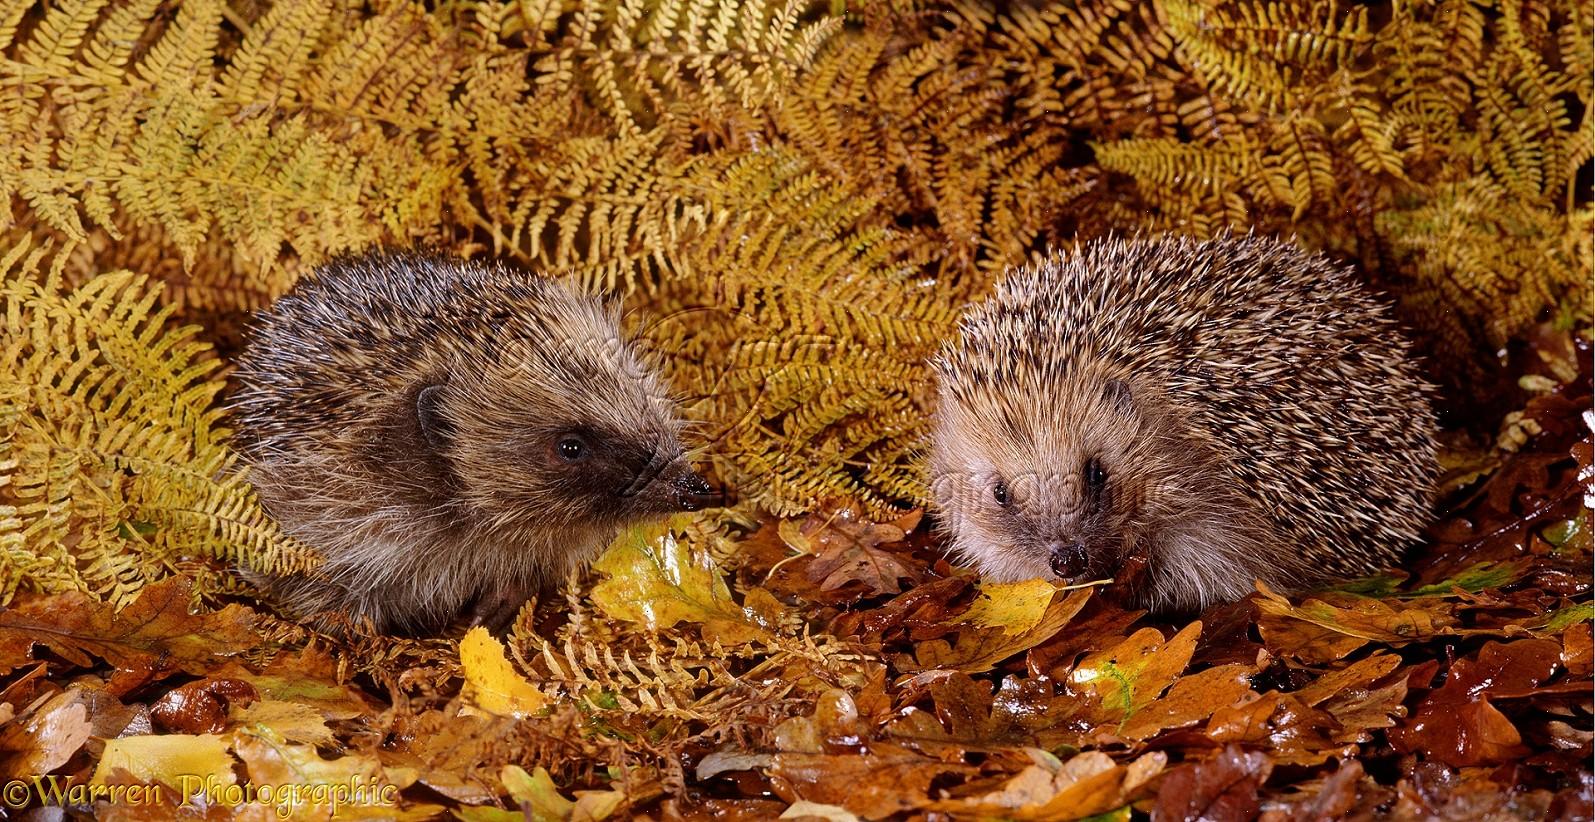 http://www.warrenphotographic.co.uk/photography/bigs/13509-Hedgehogs.jpg